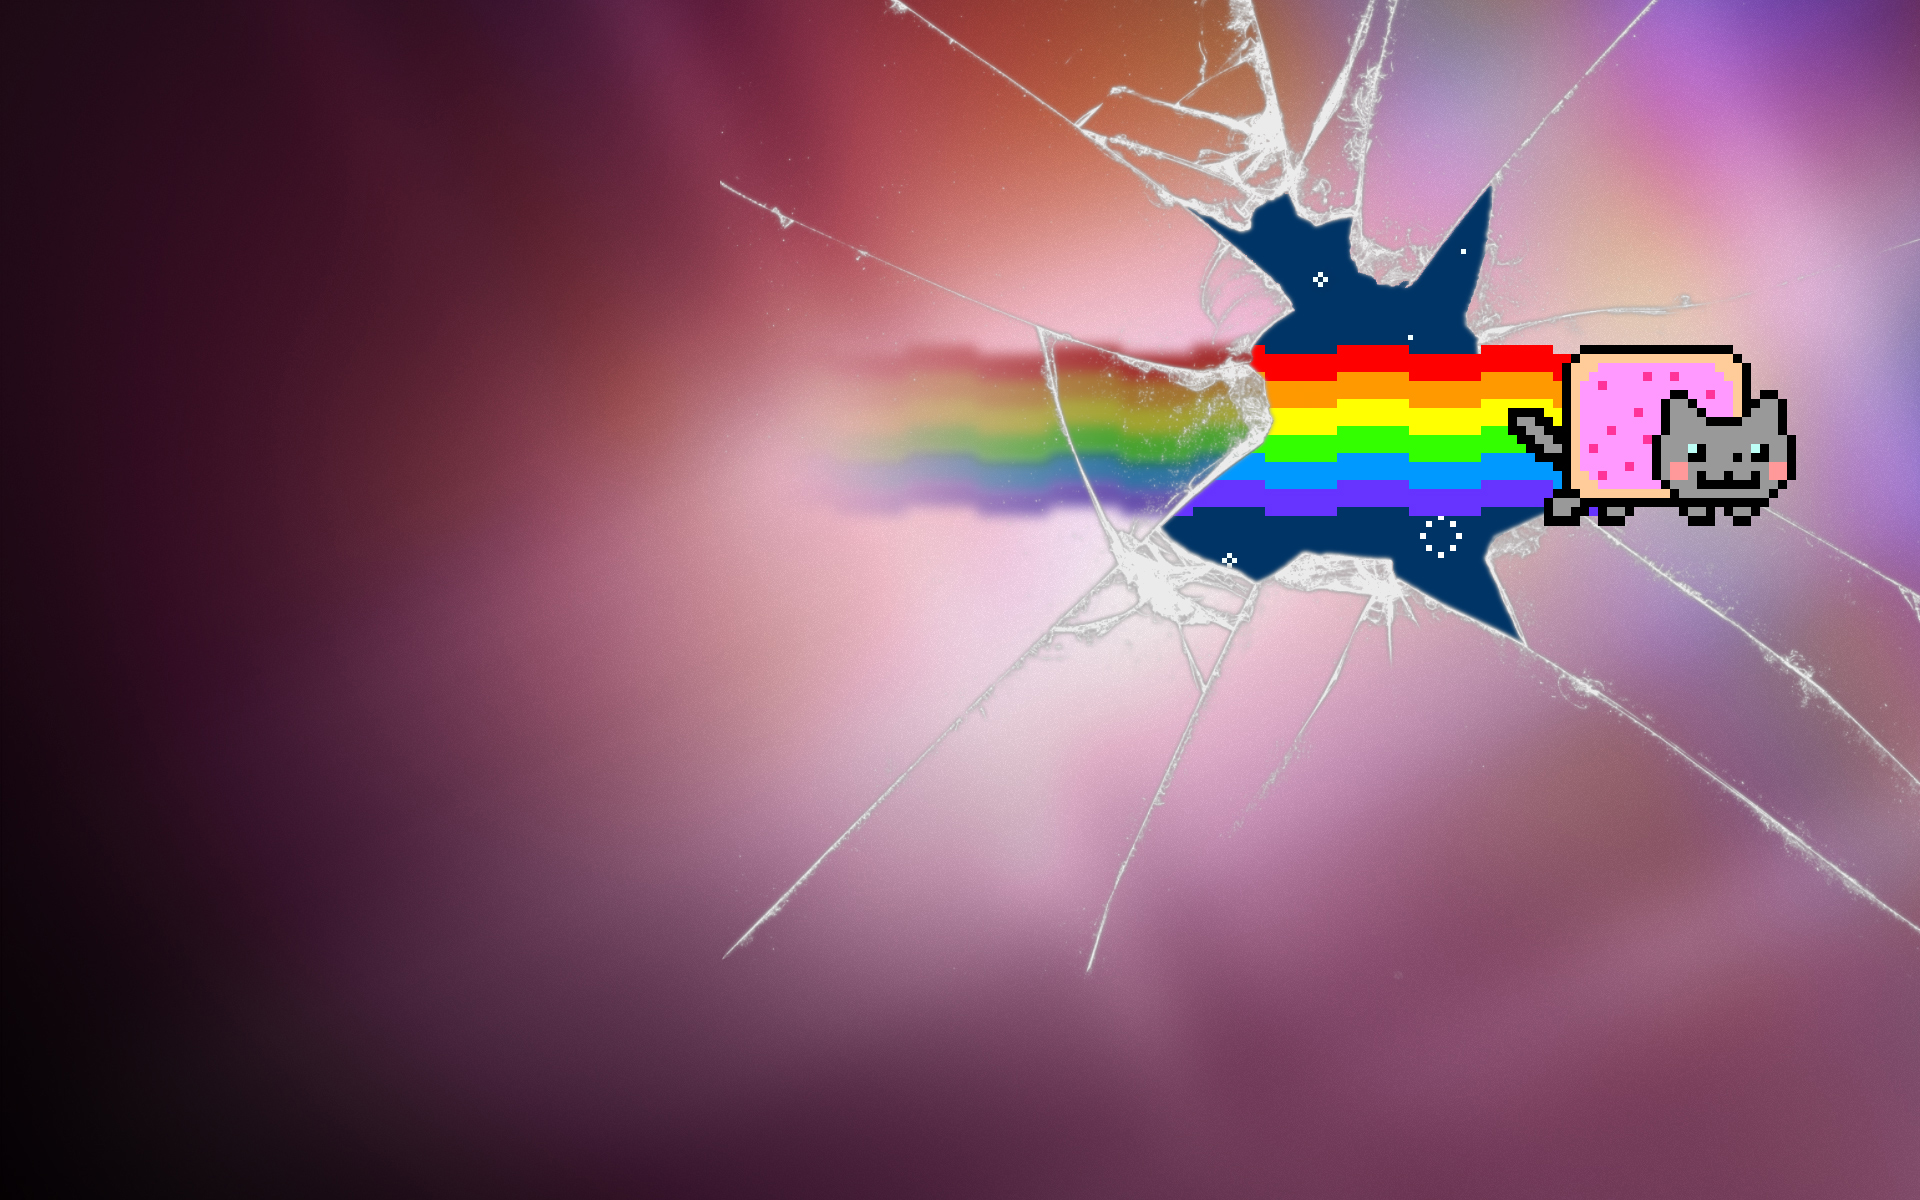 """Nyan Cat Oneric"" Wallpaper by Jayro-Jones"